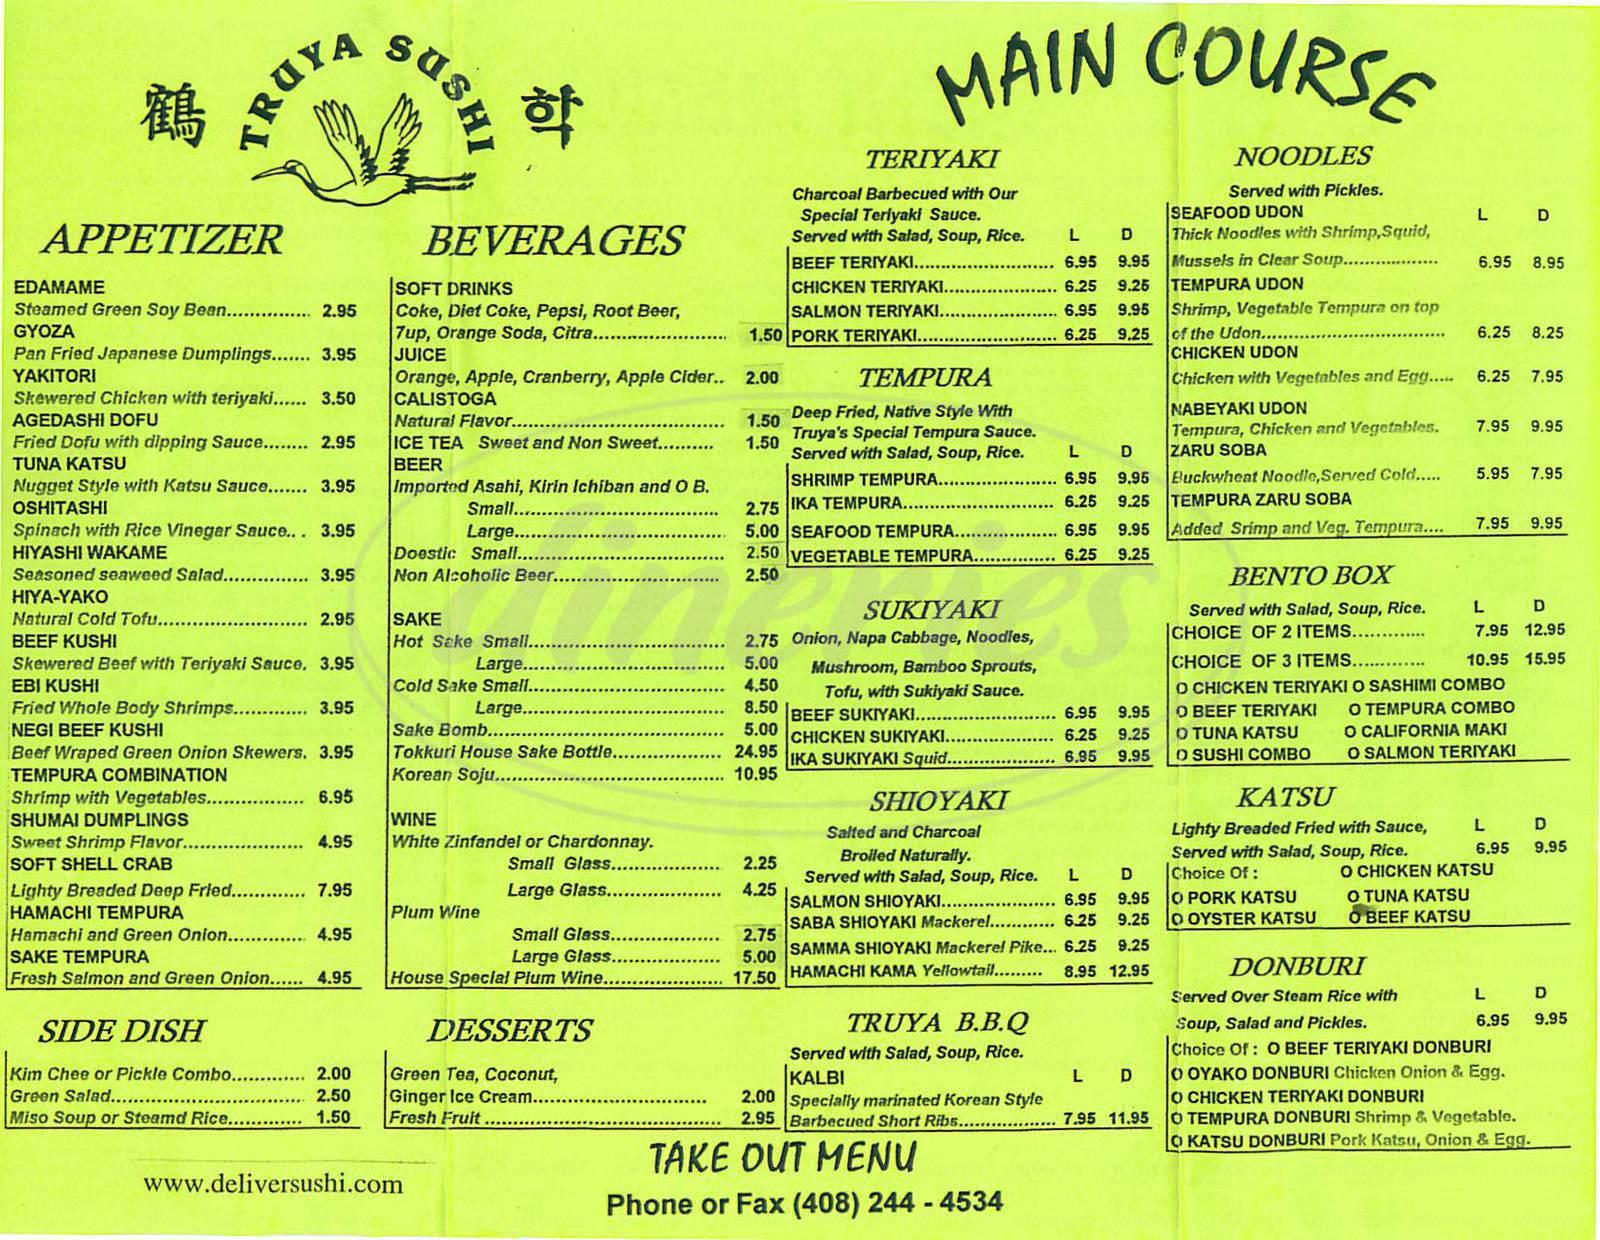 menu for Truya Sushi